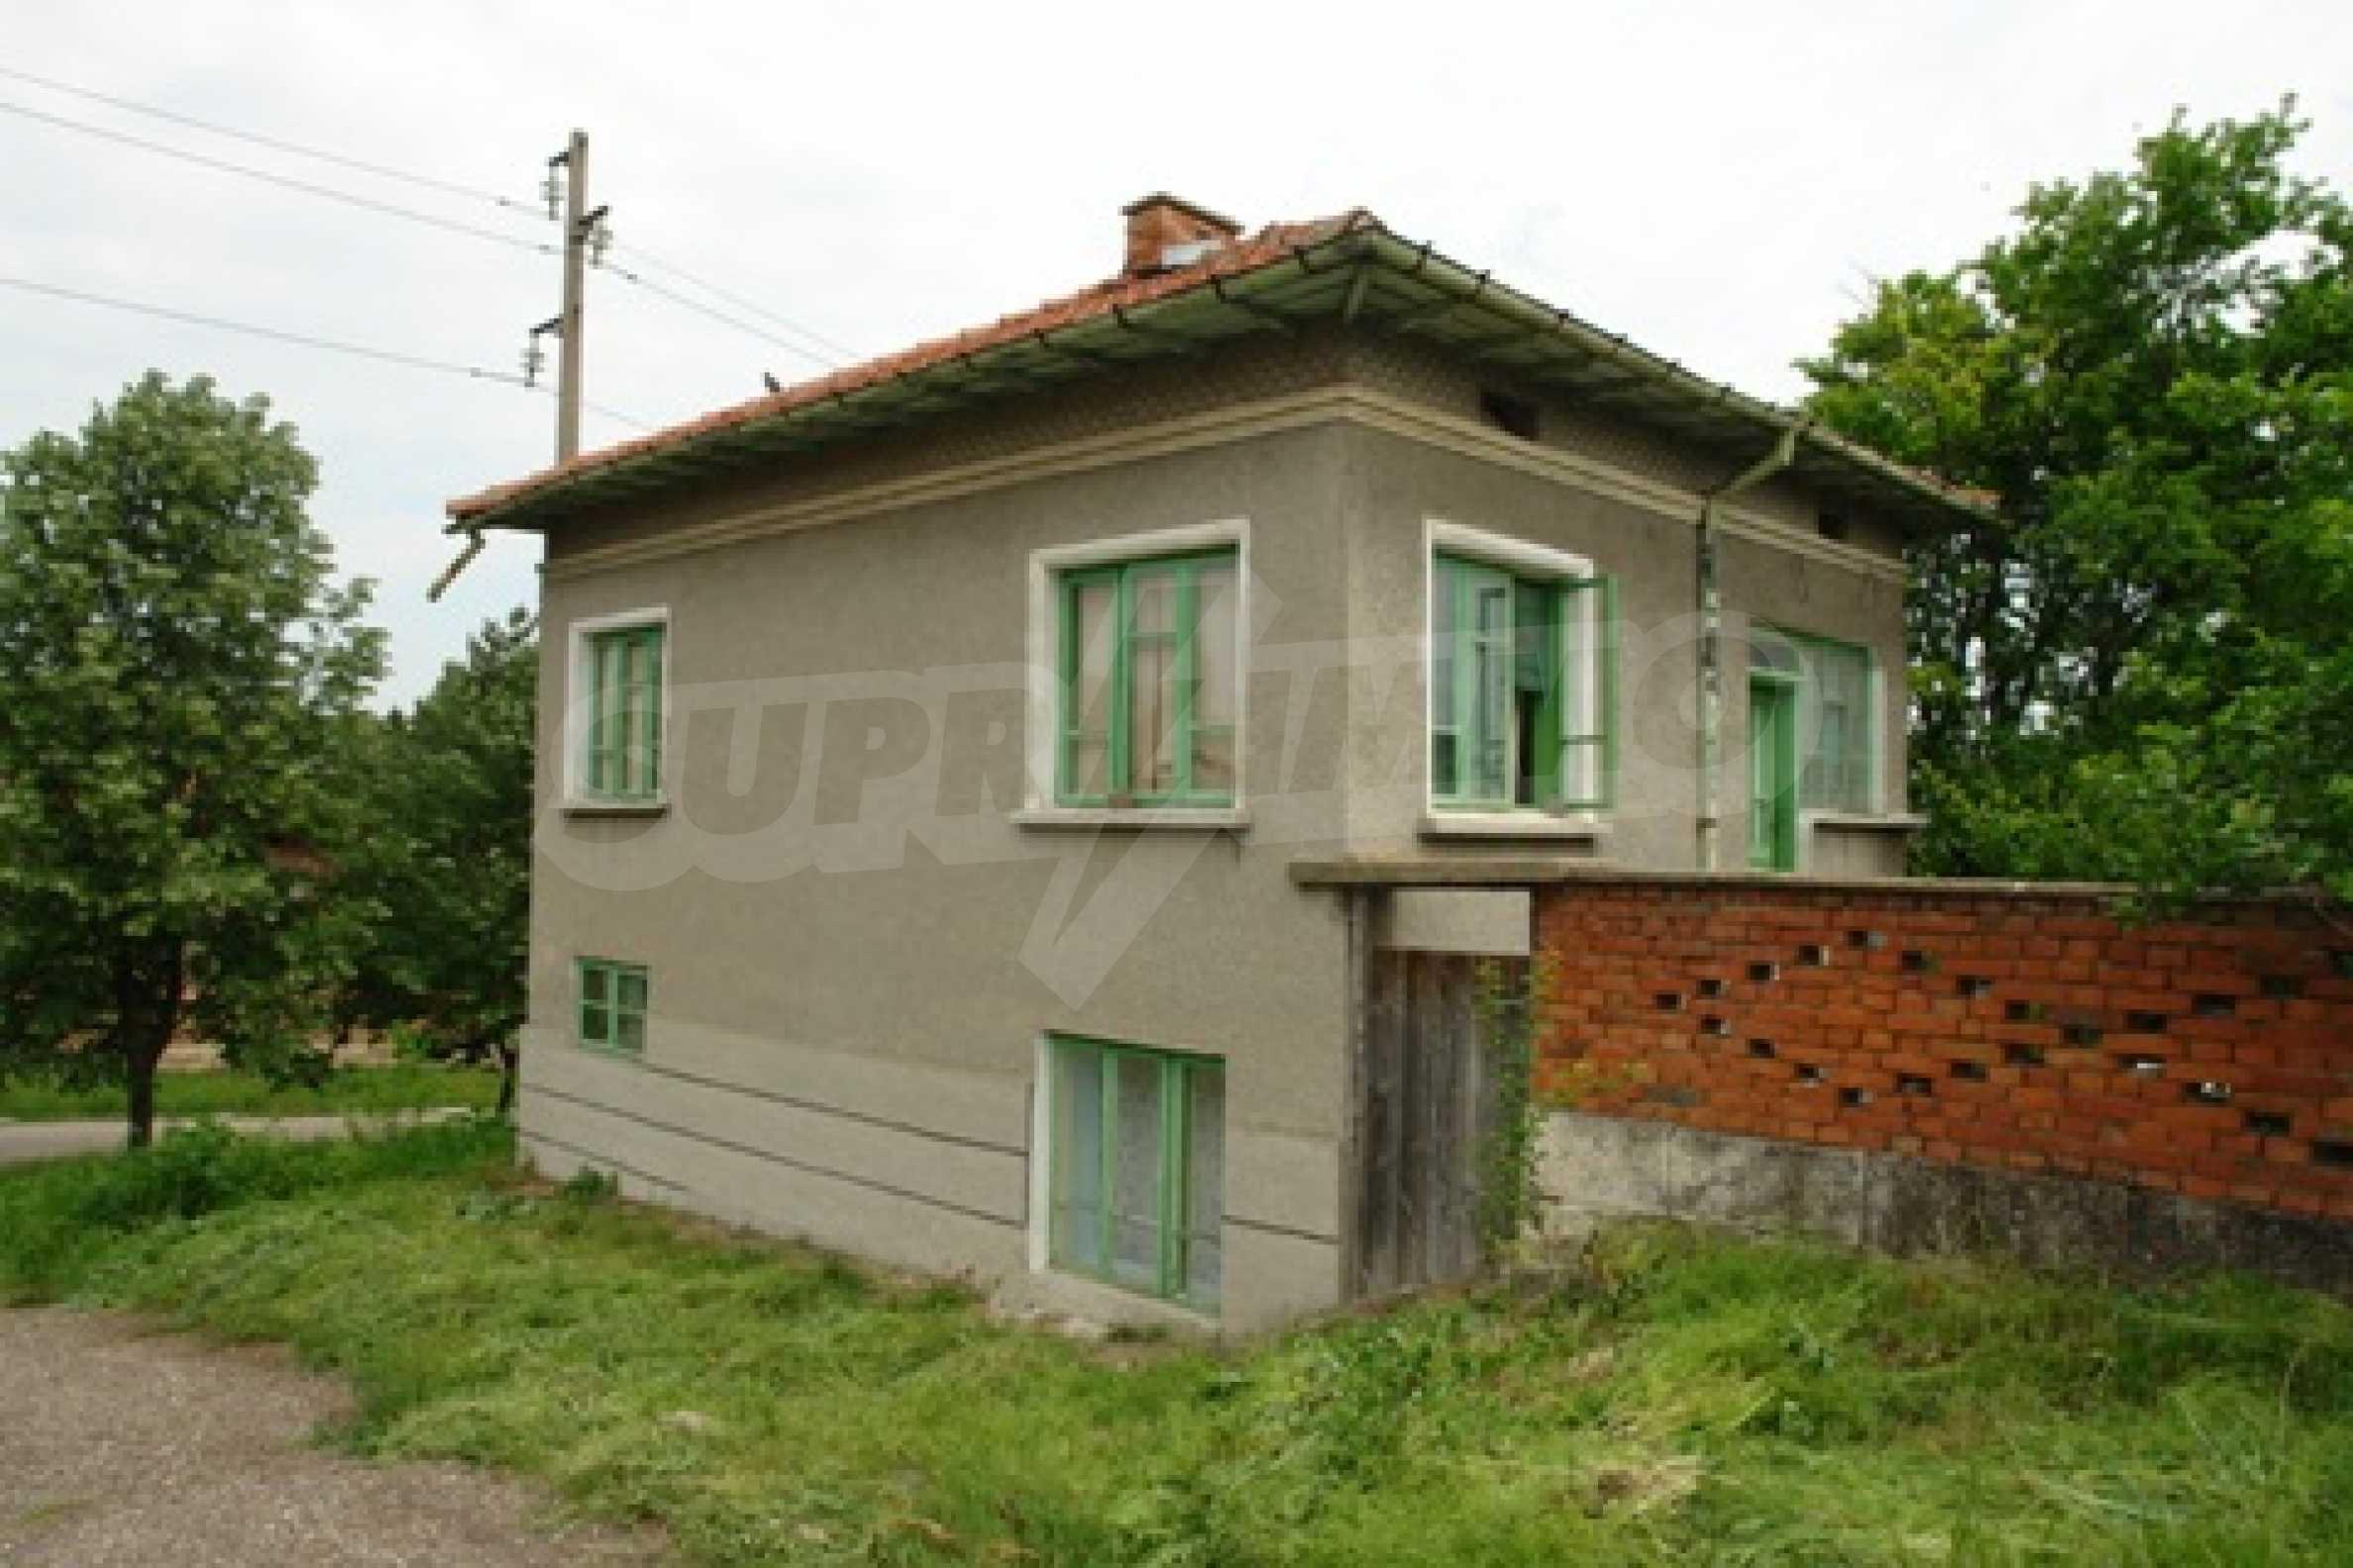 Spacious two-storey 4-bedroom house in Trastenik village, Ruse district